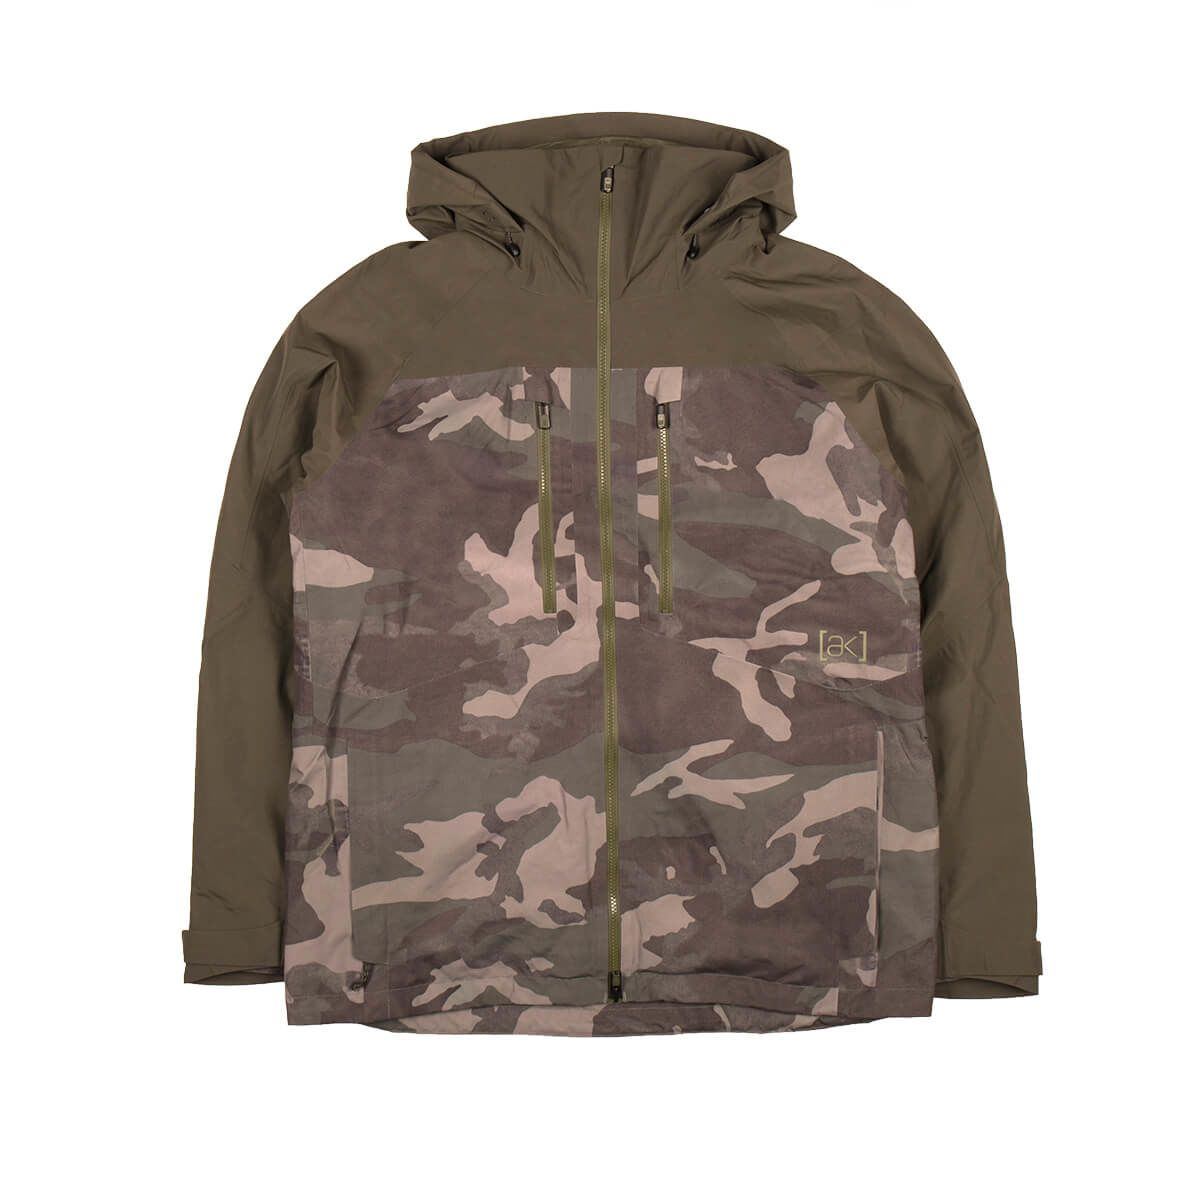 BURTON Goretex Swash Jacket in Green